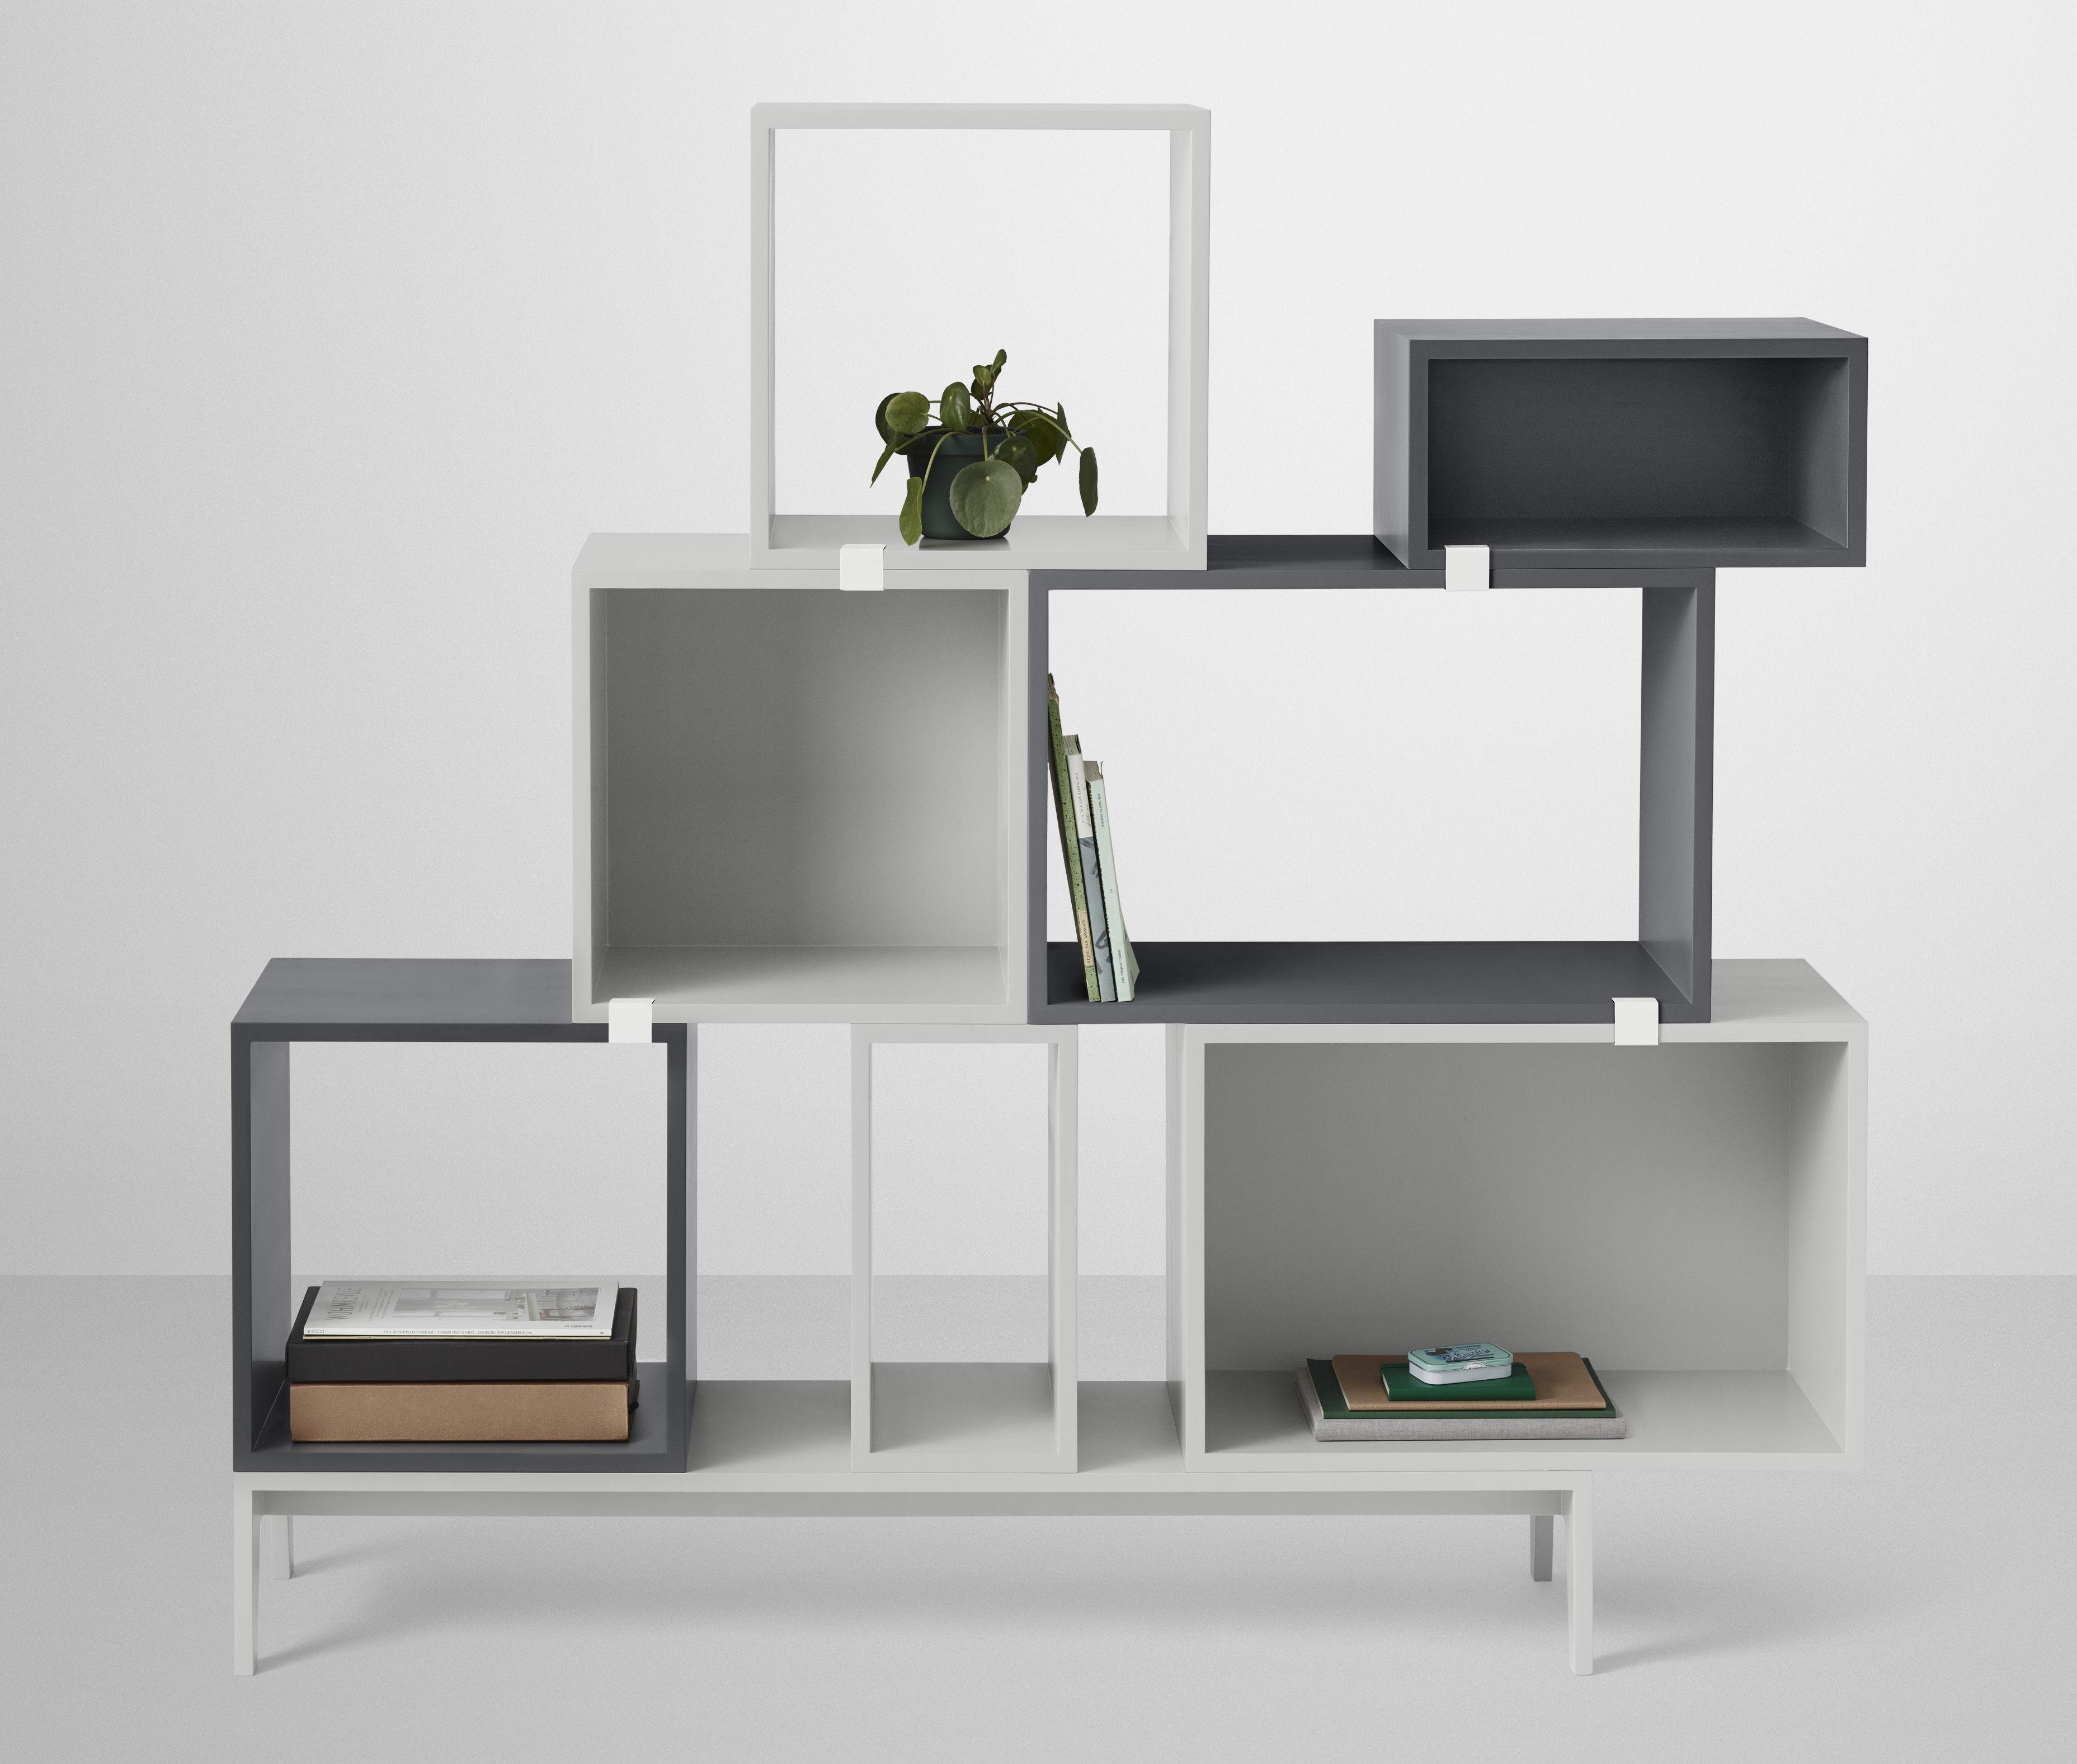 etag re stacked medium carr 43x43 cm avec fond color fr ne fond vert cendre muuto. Black Bedroom Furniture Sets. Home Design Ideas